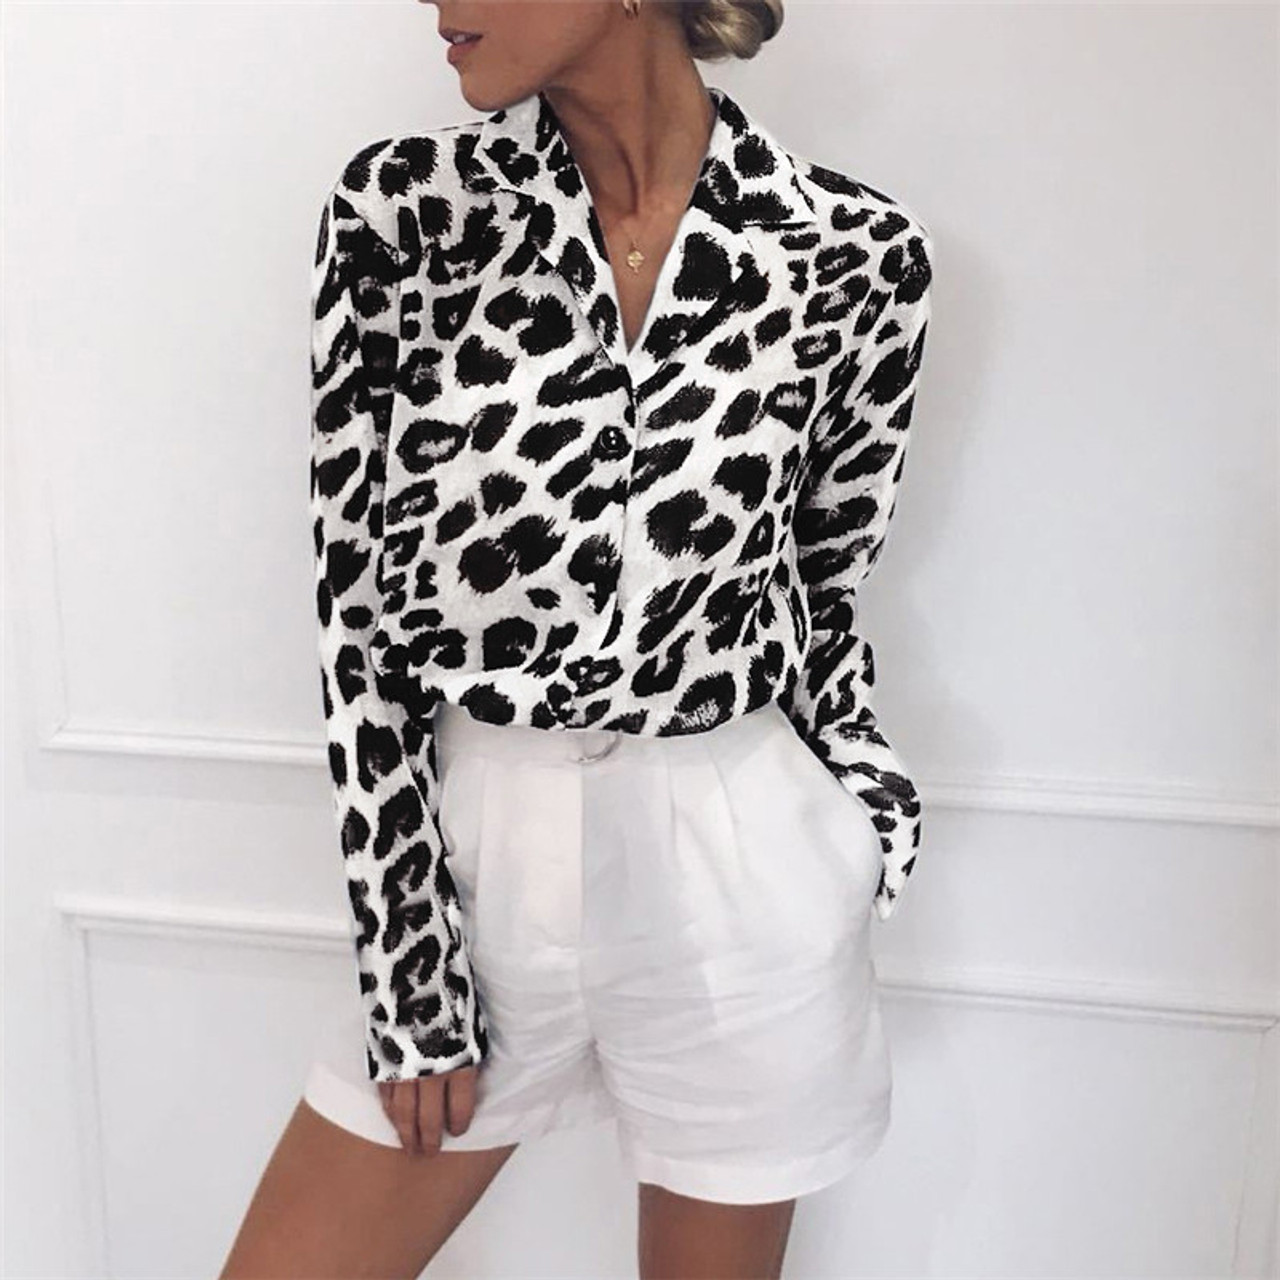 628e6c89790 2019 Women Blouse Leopard Print Shirt Long Sleeve Top Loose Blouses Plus  Size Chiffon Shirt Camisa Feminina Clothing - OnshopDeals.Com